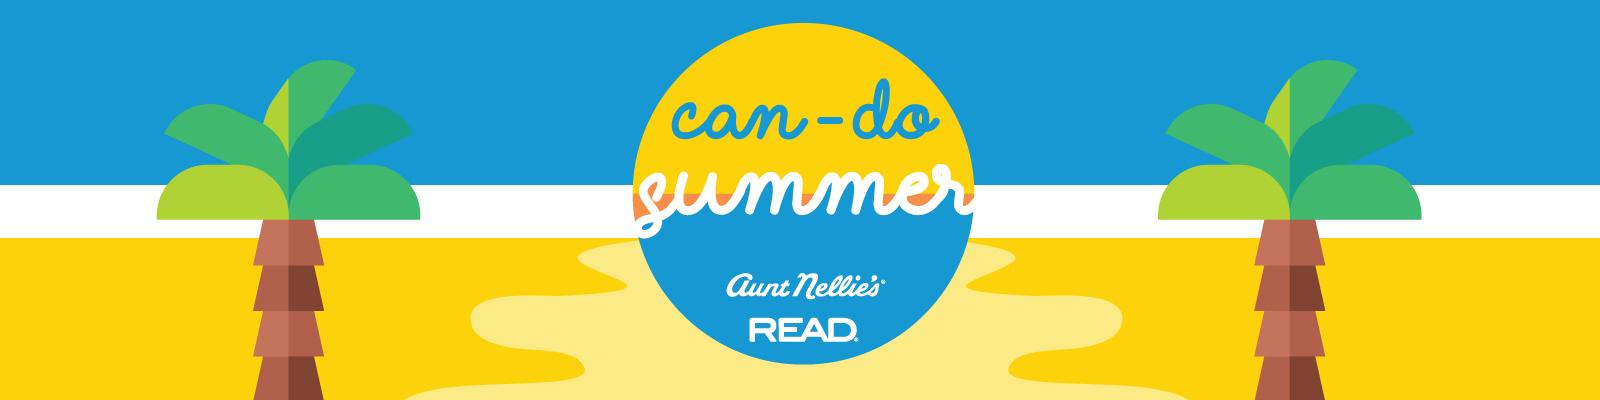 Can-do Summer